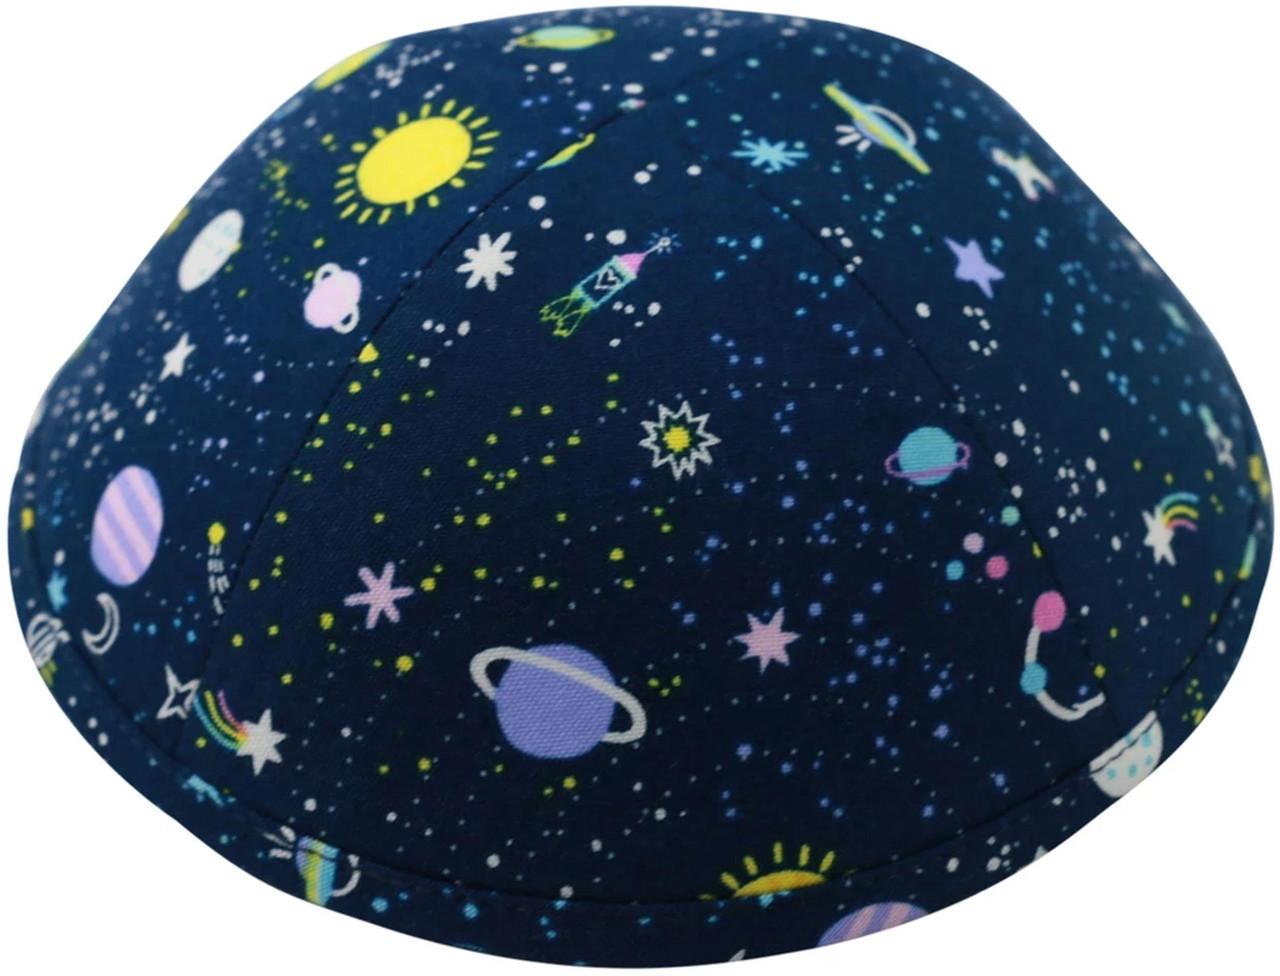 iKippah Yarmulka - Outer Space